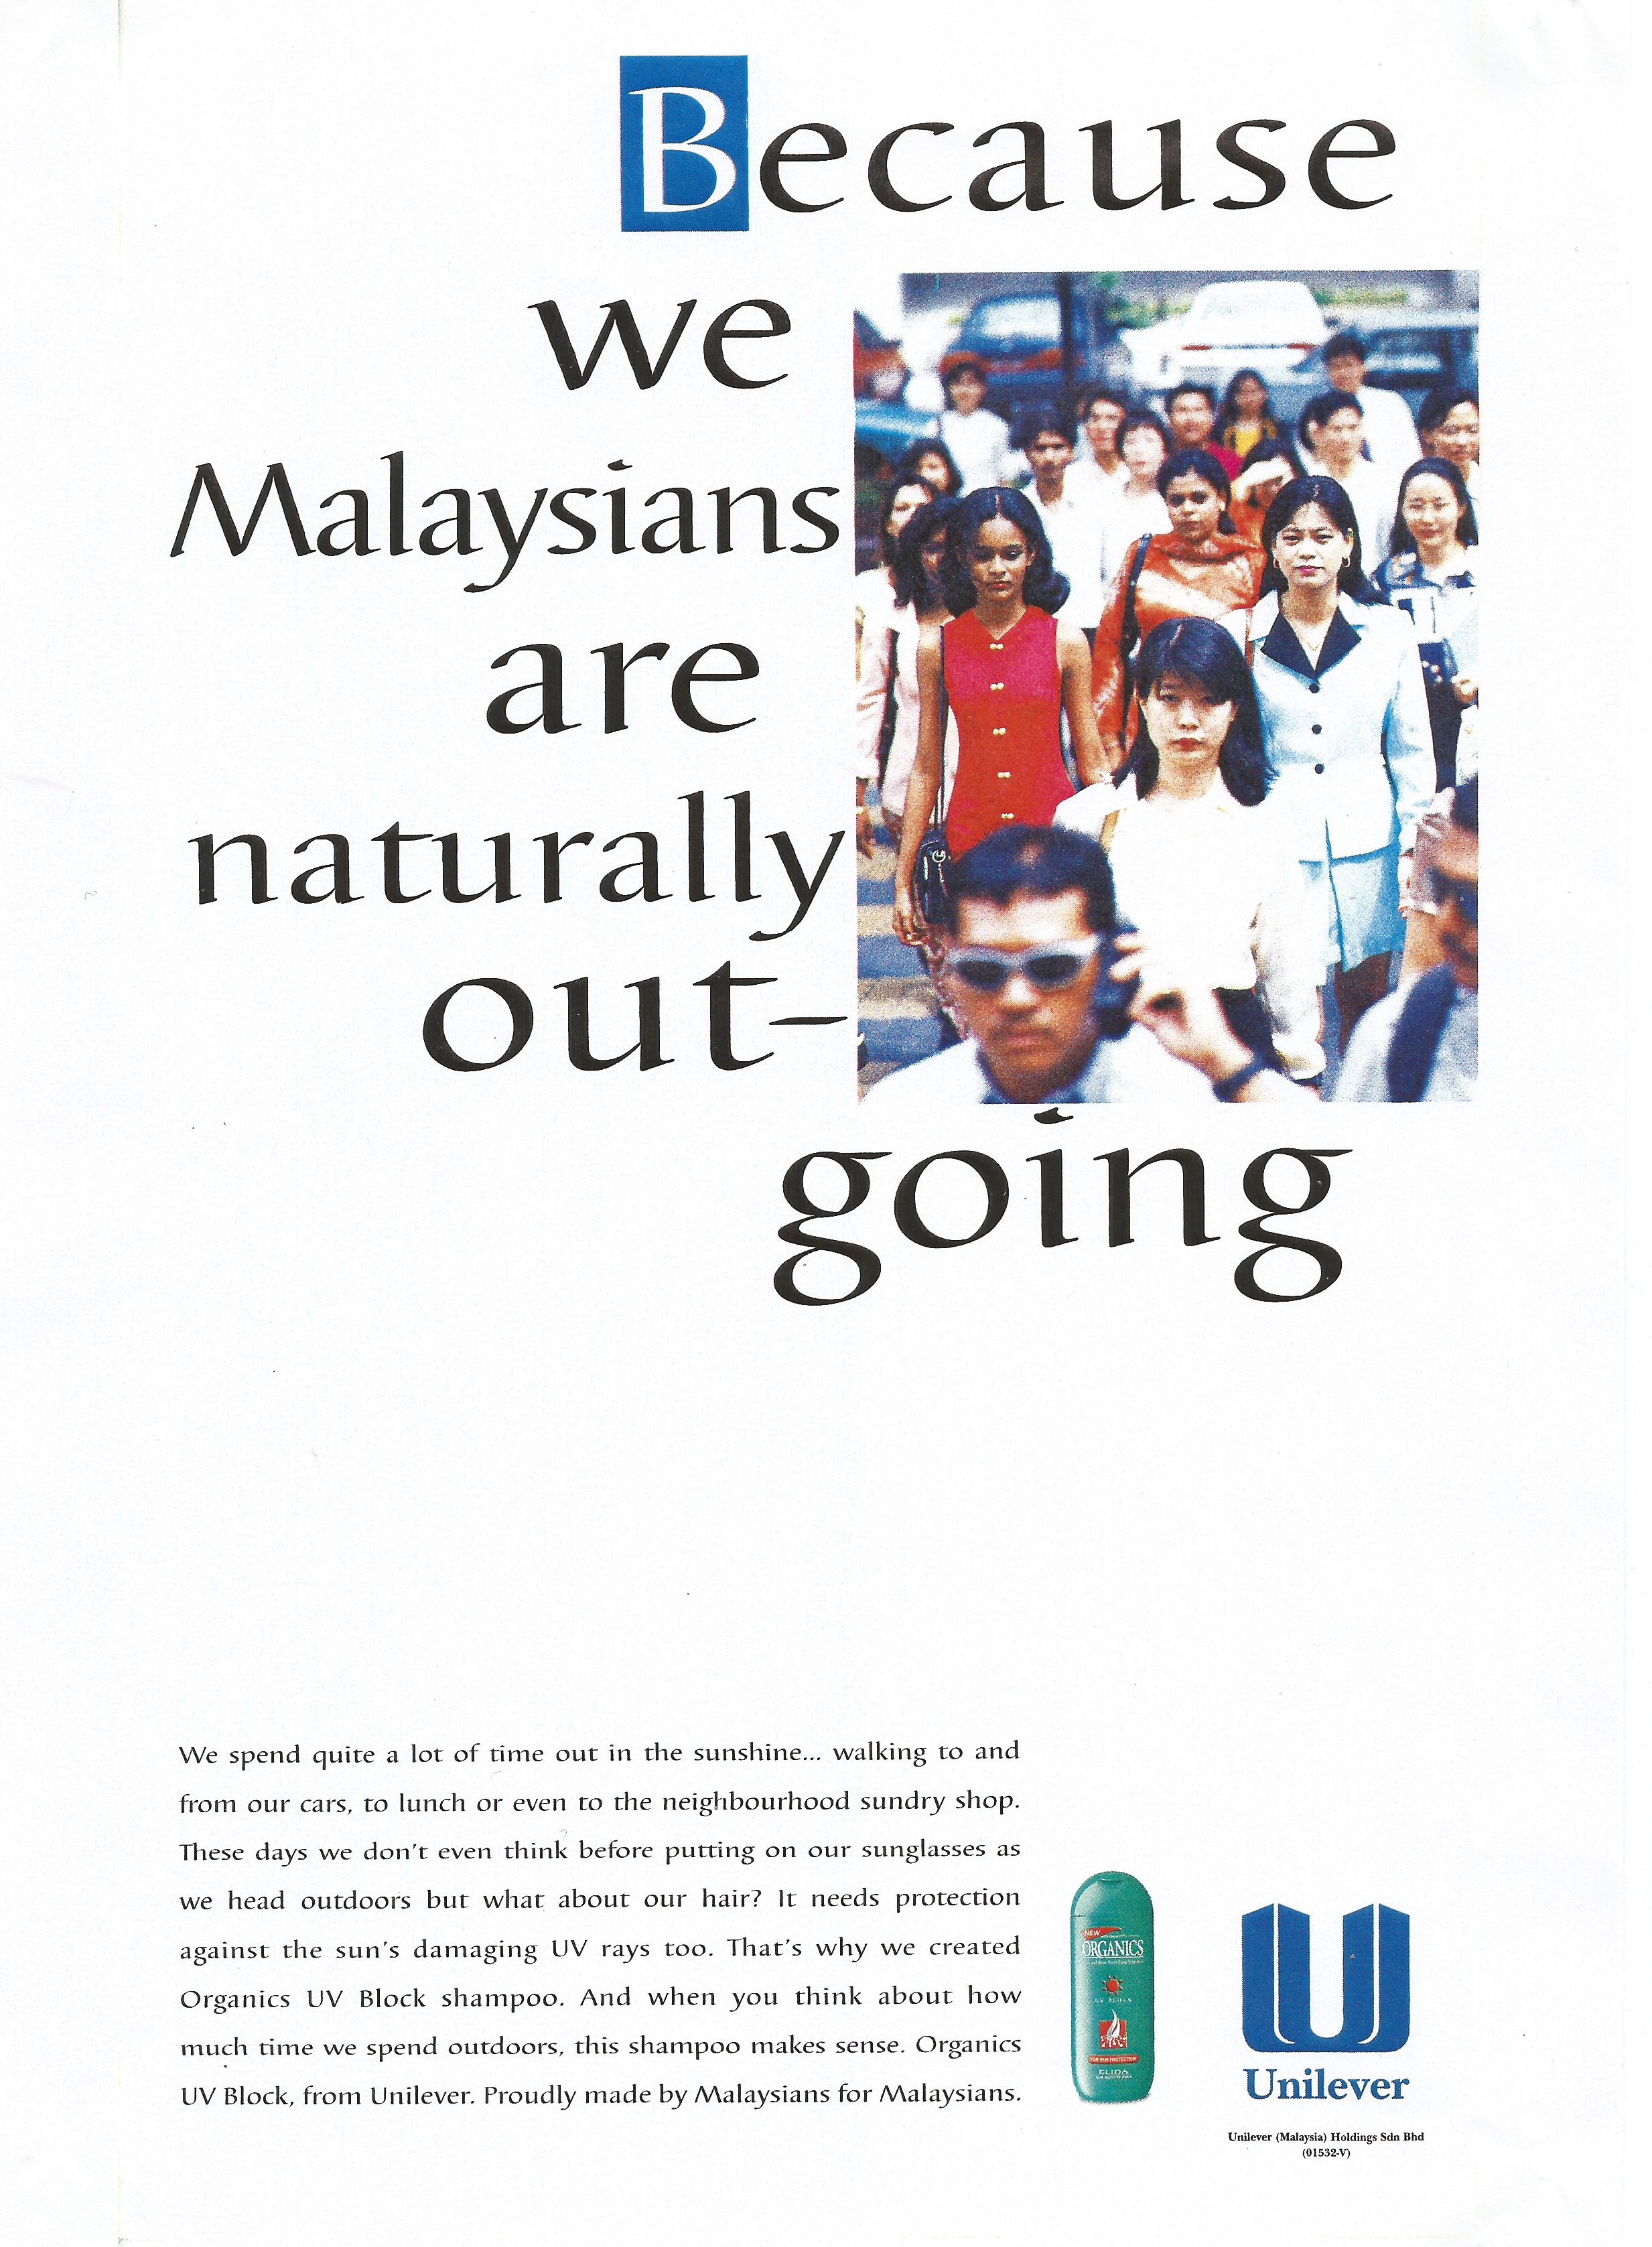 Organics Shampoo Ad .jpeg